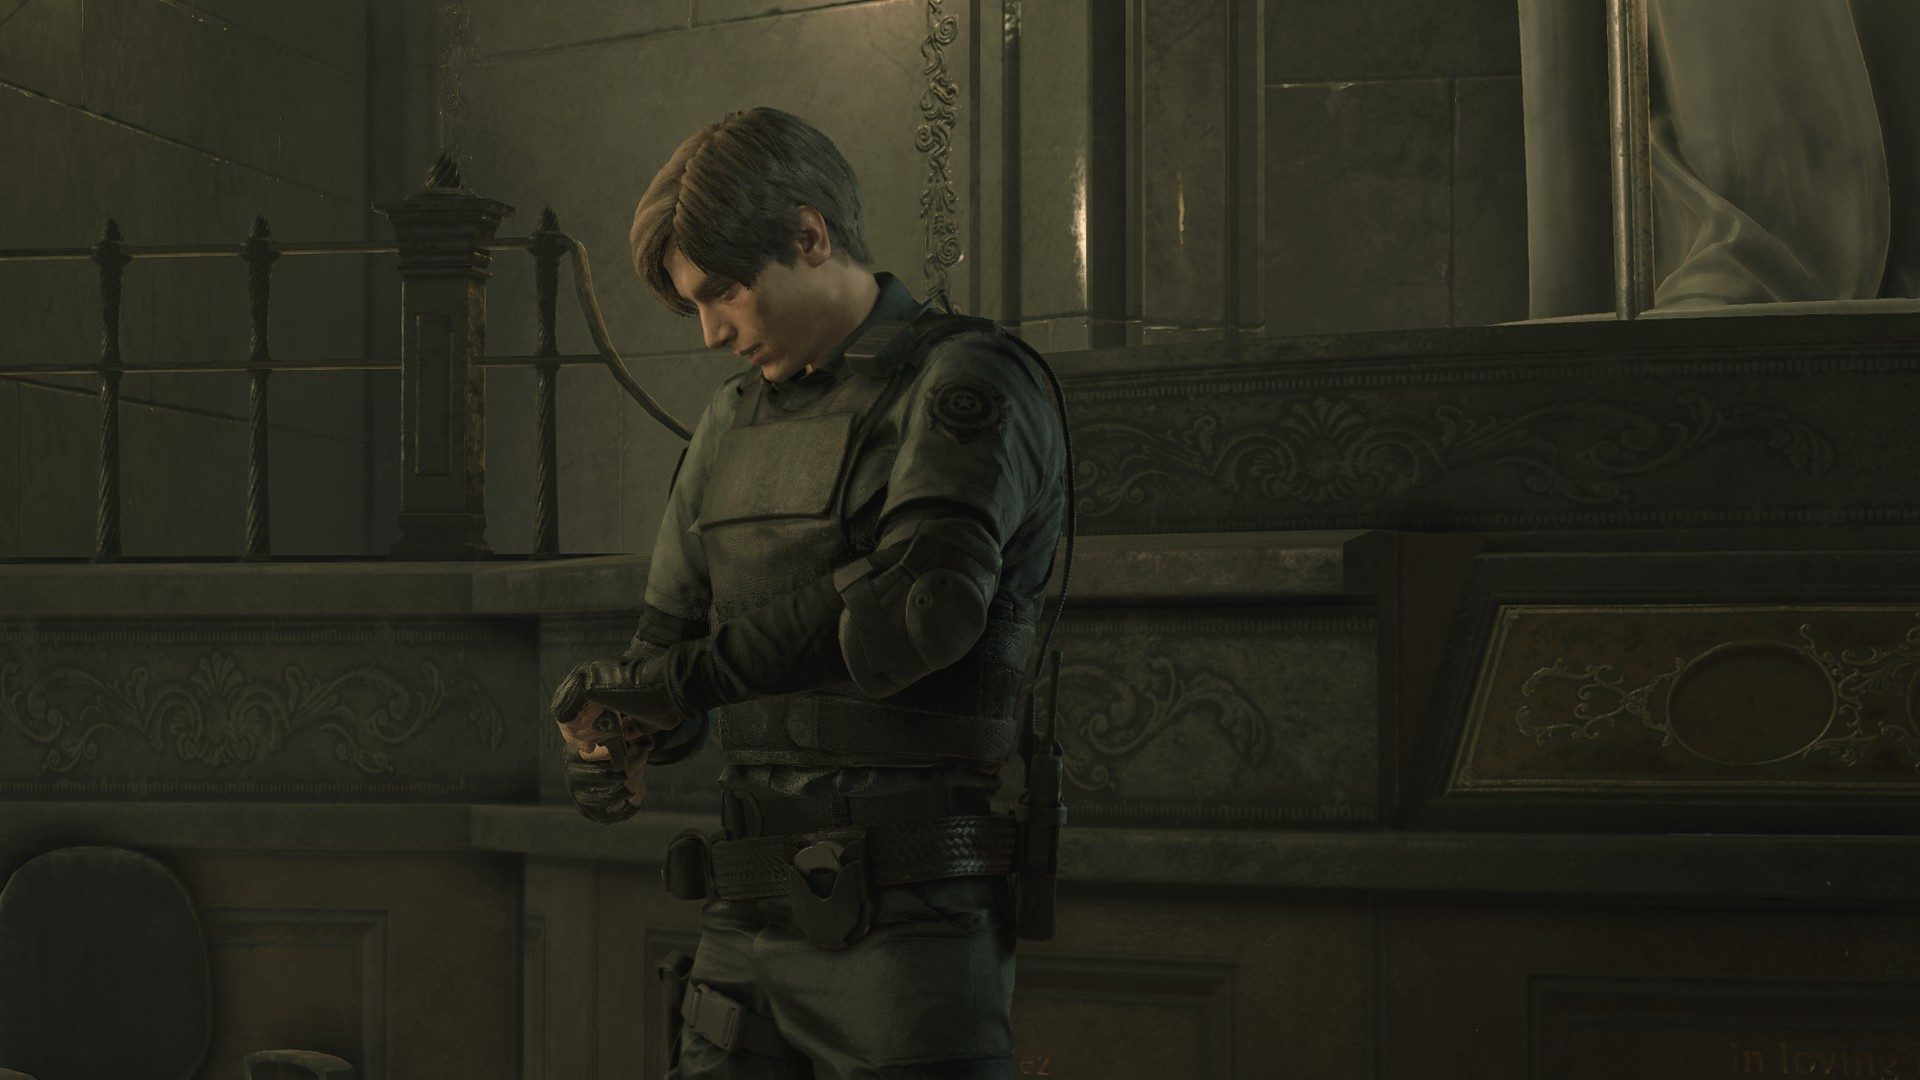 Leon RPD Camo Pack Mod - Resident Evil 2 Remake Mods